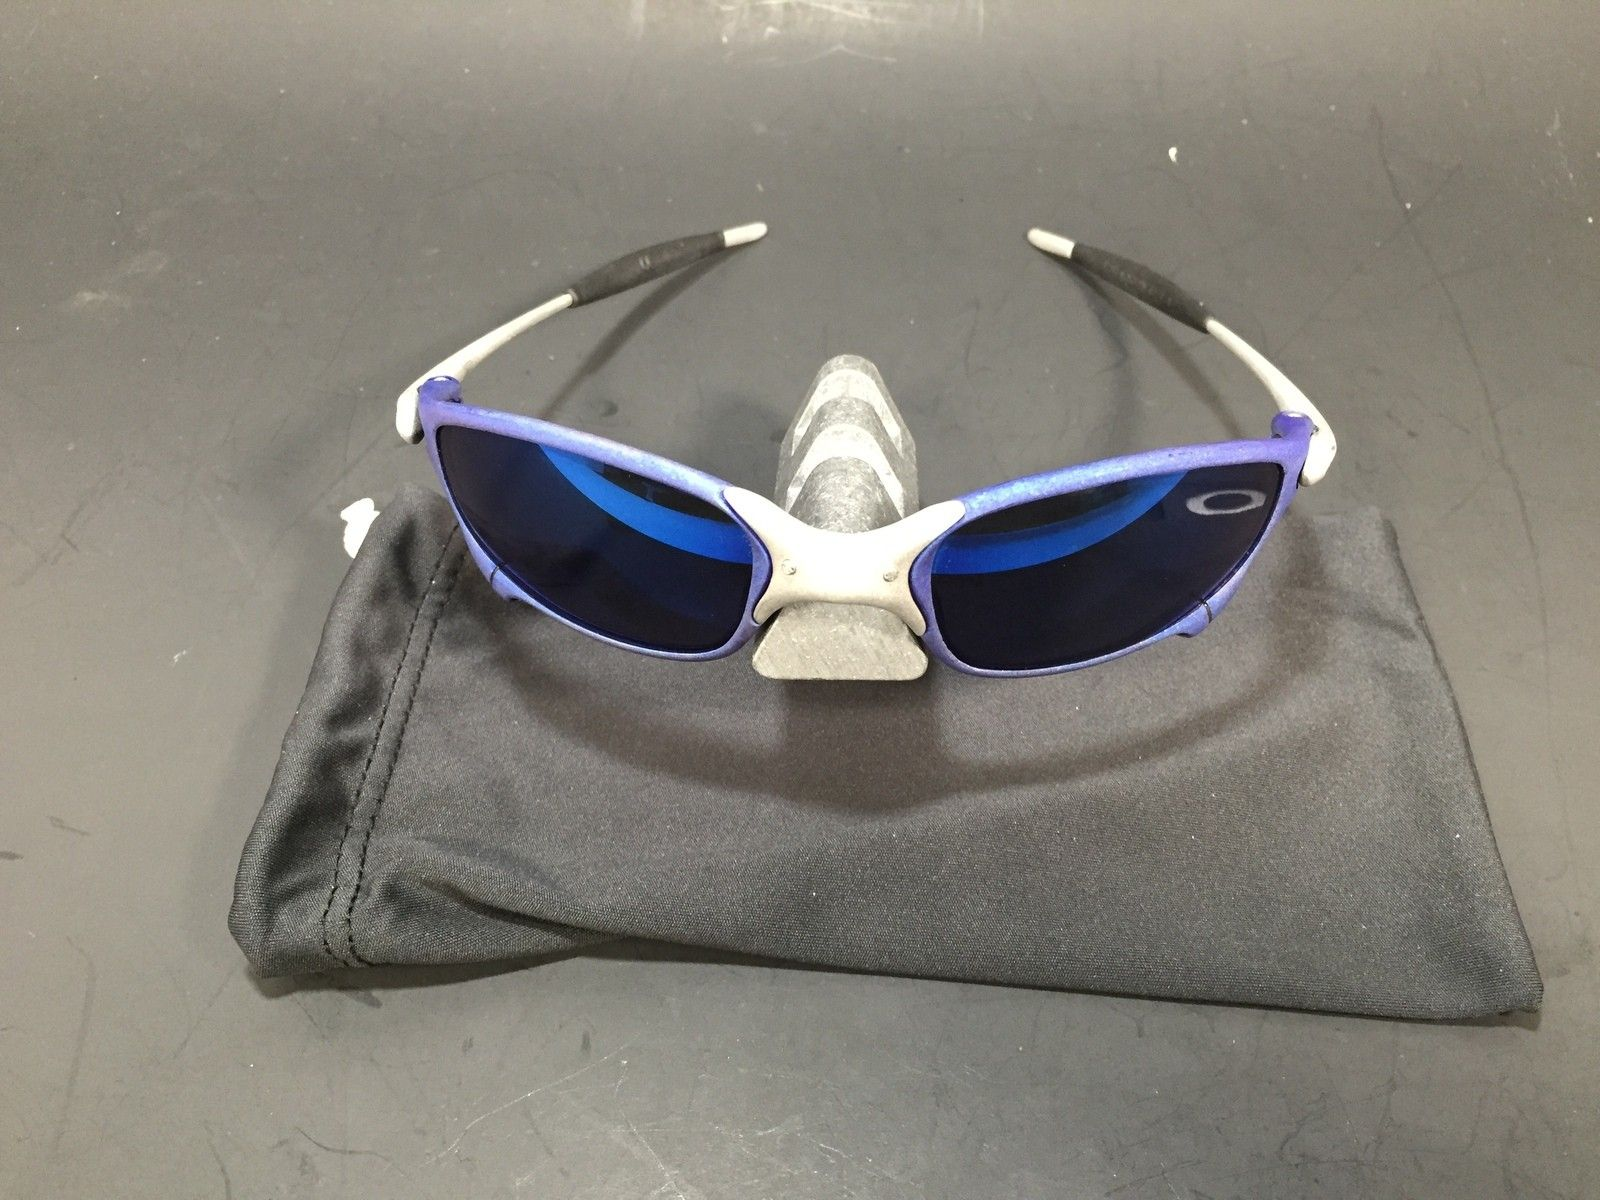 Anodized Juliet Dallas Cowboys colors Blue/Silver w/ OEM Ice Lenses - IMG_1775.JPG